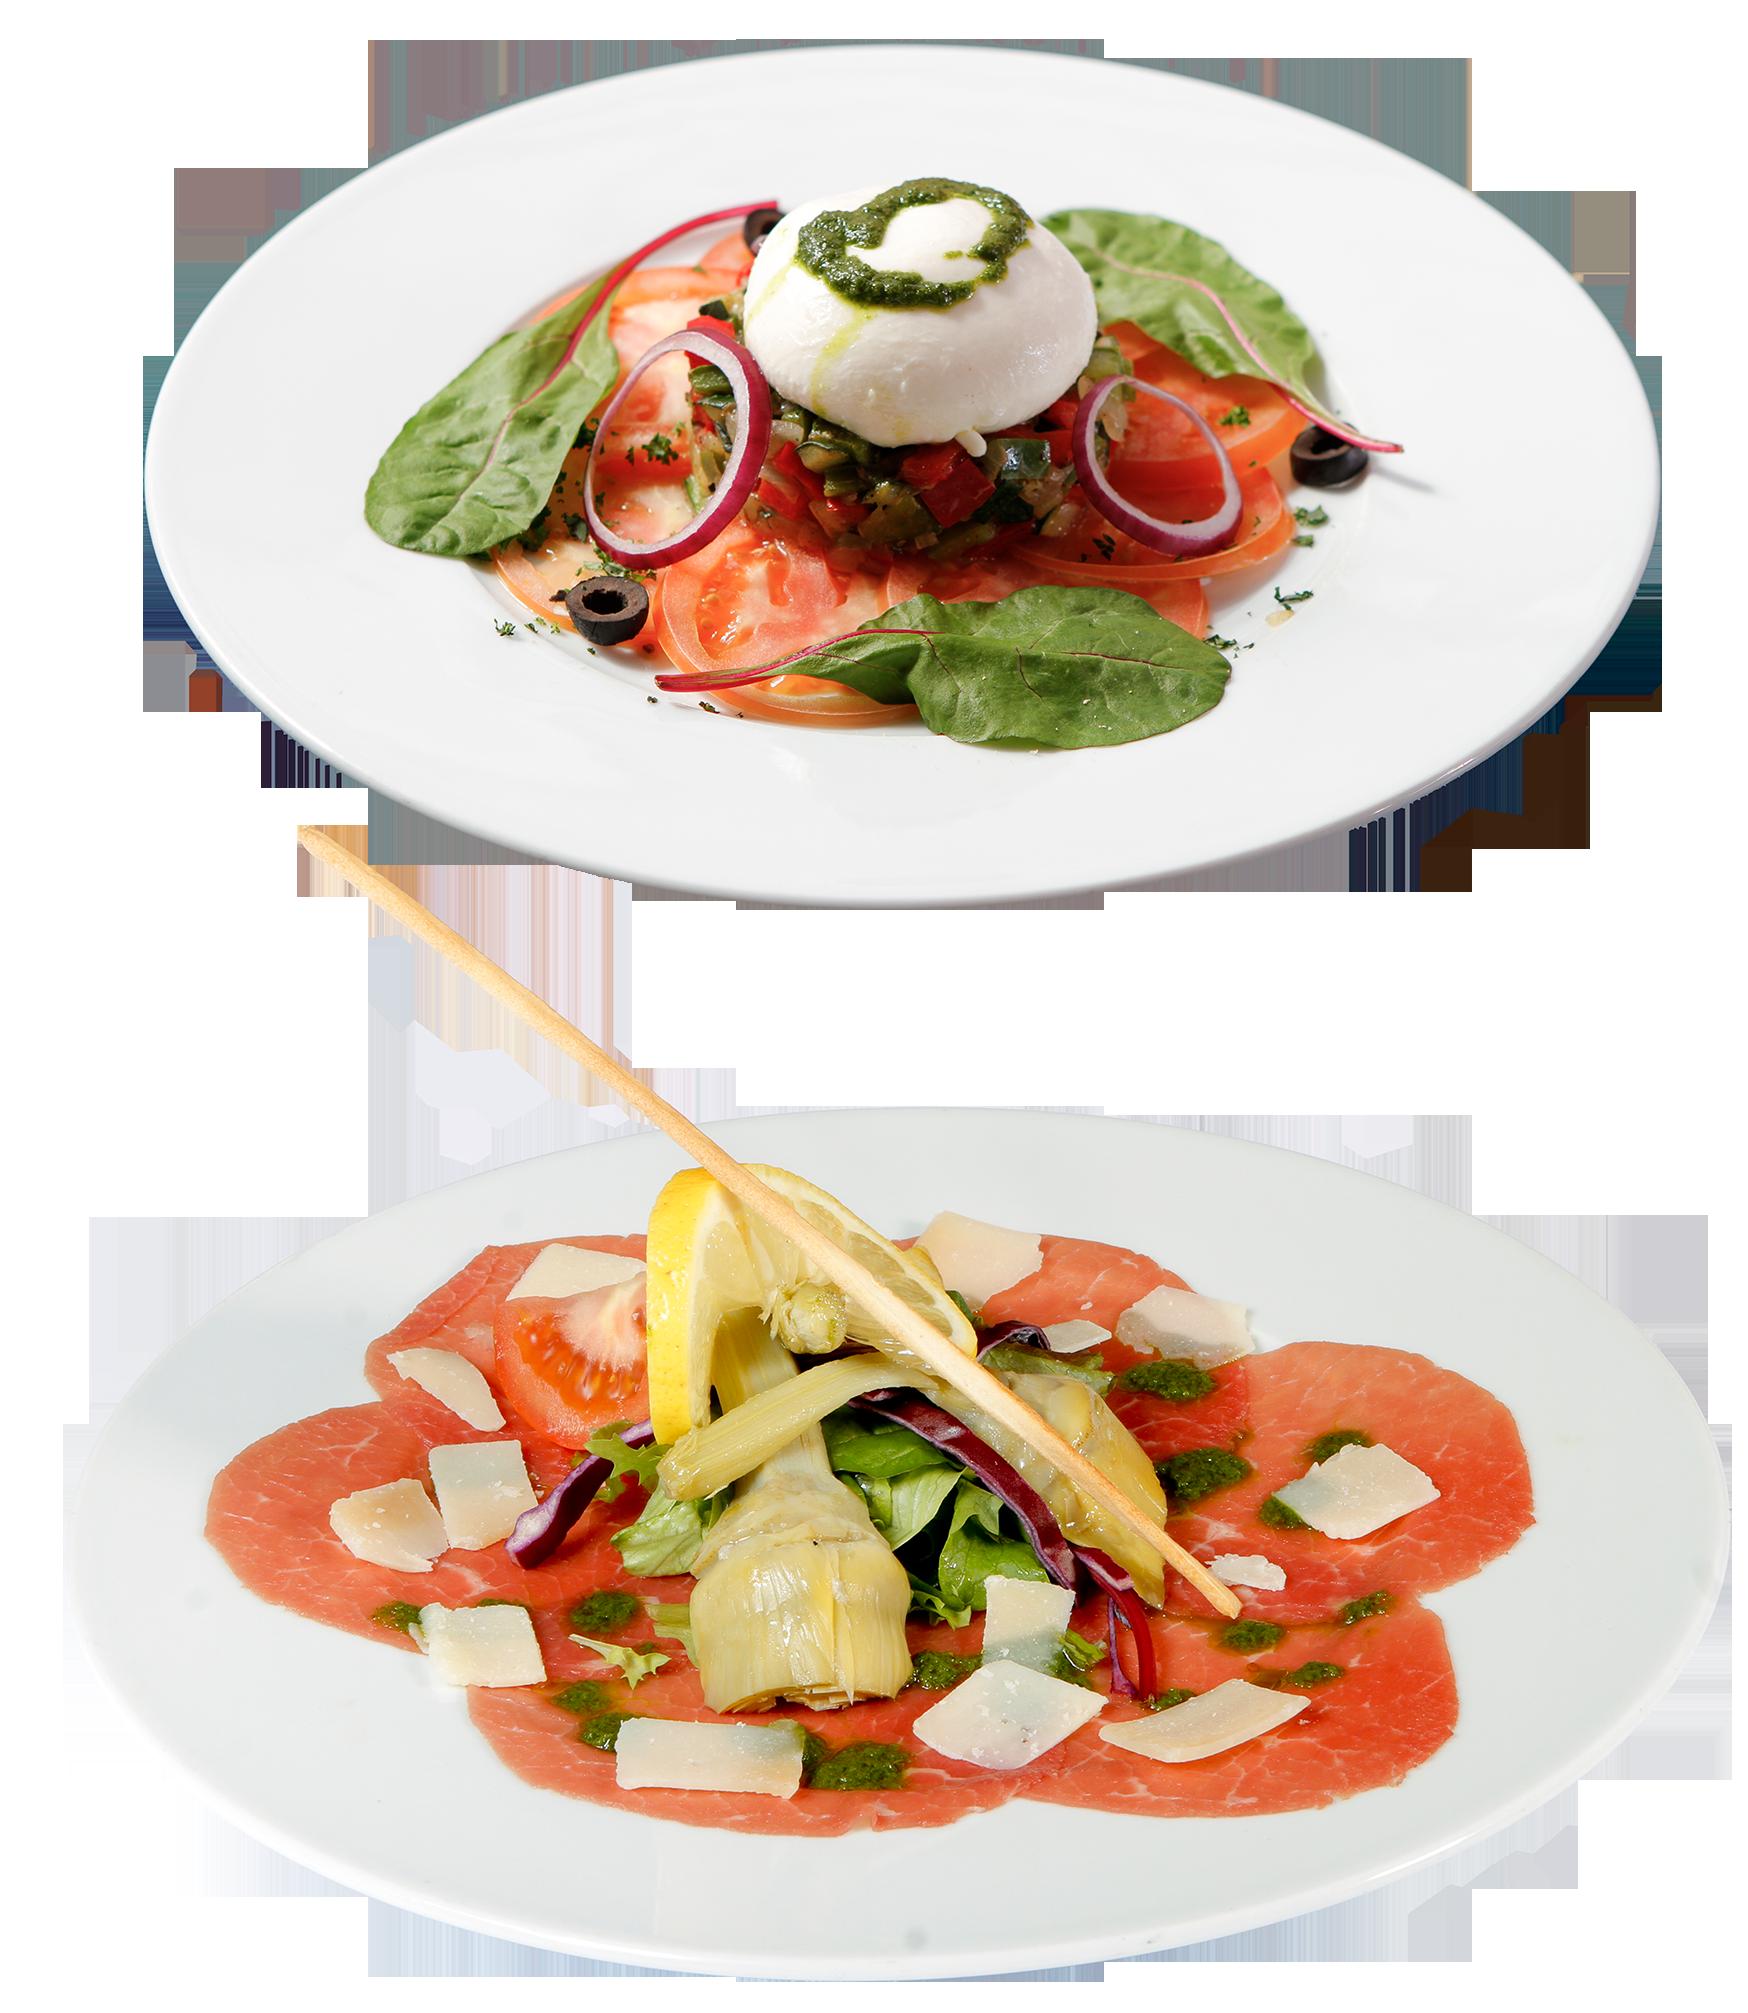 Mozzarella burrata + Carpaccio